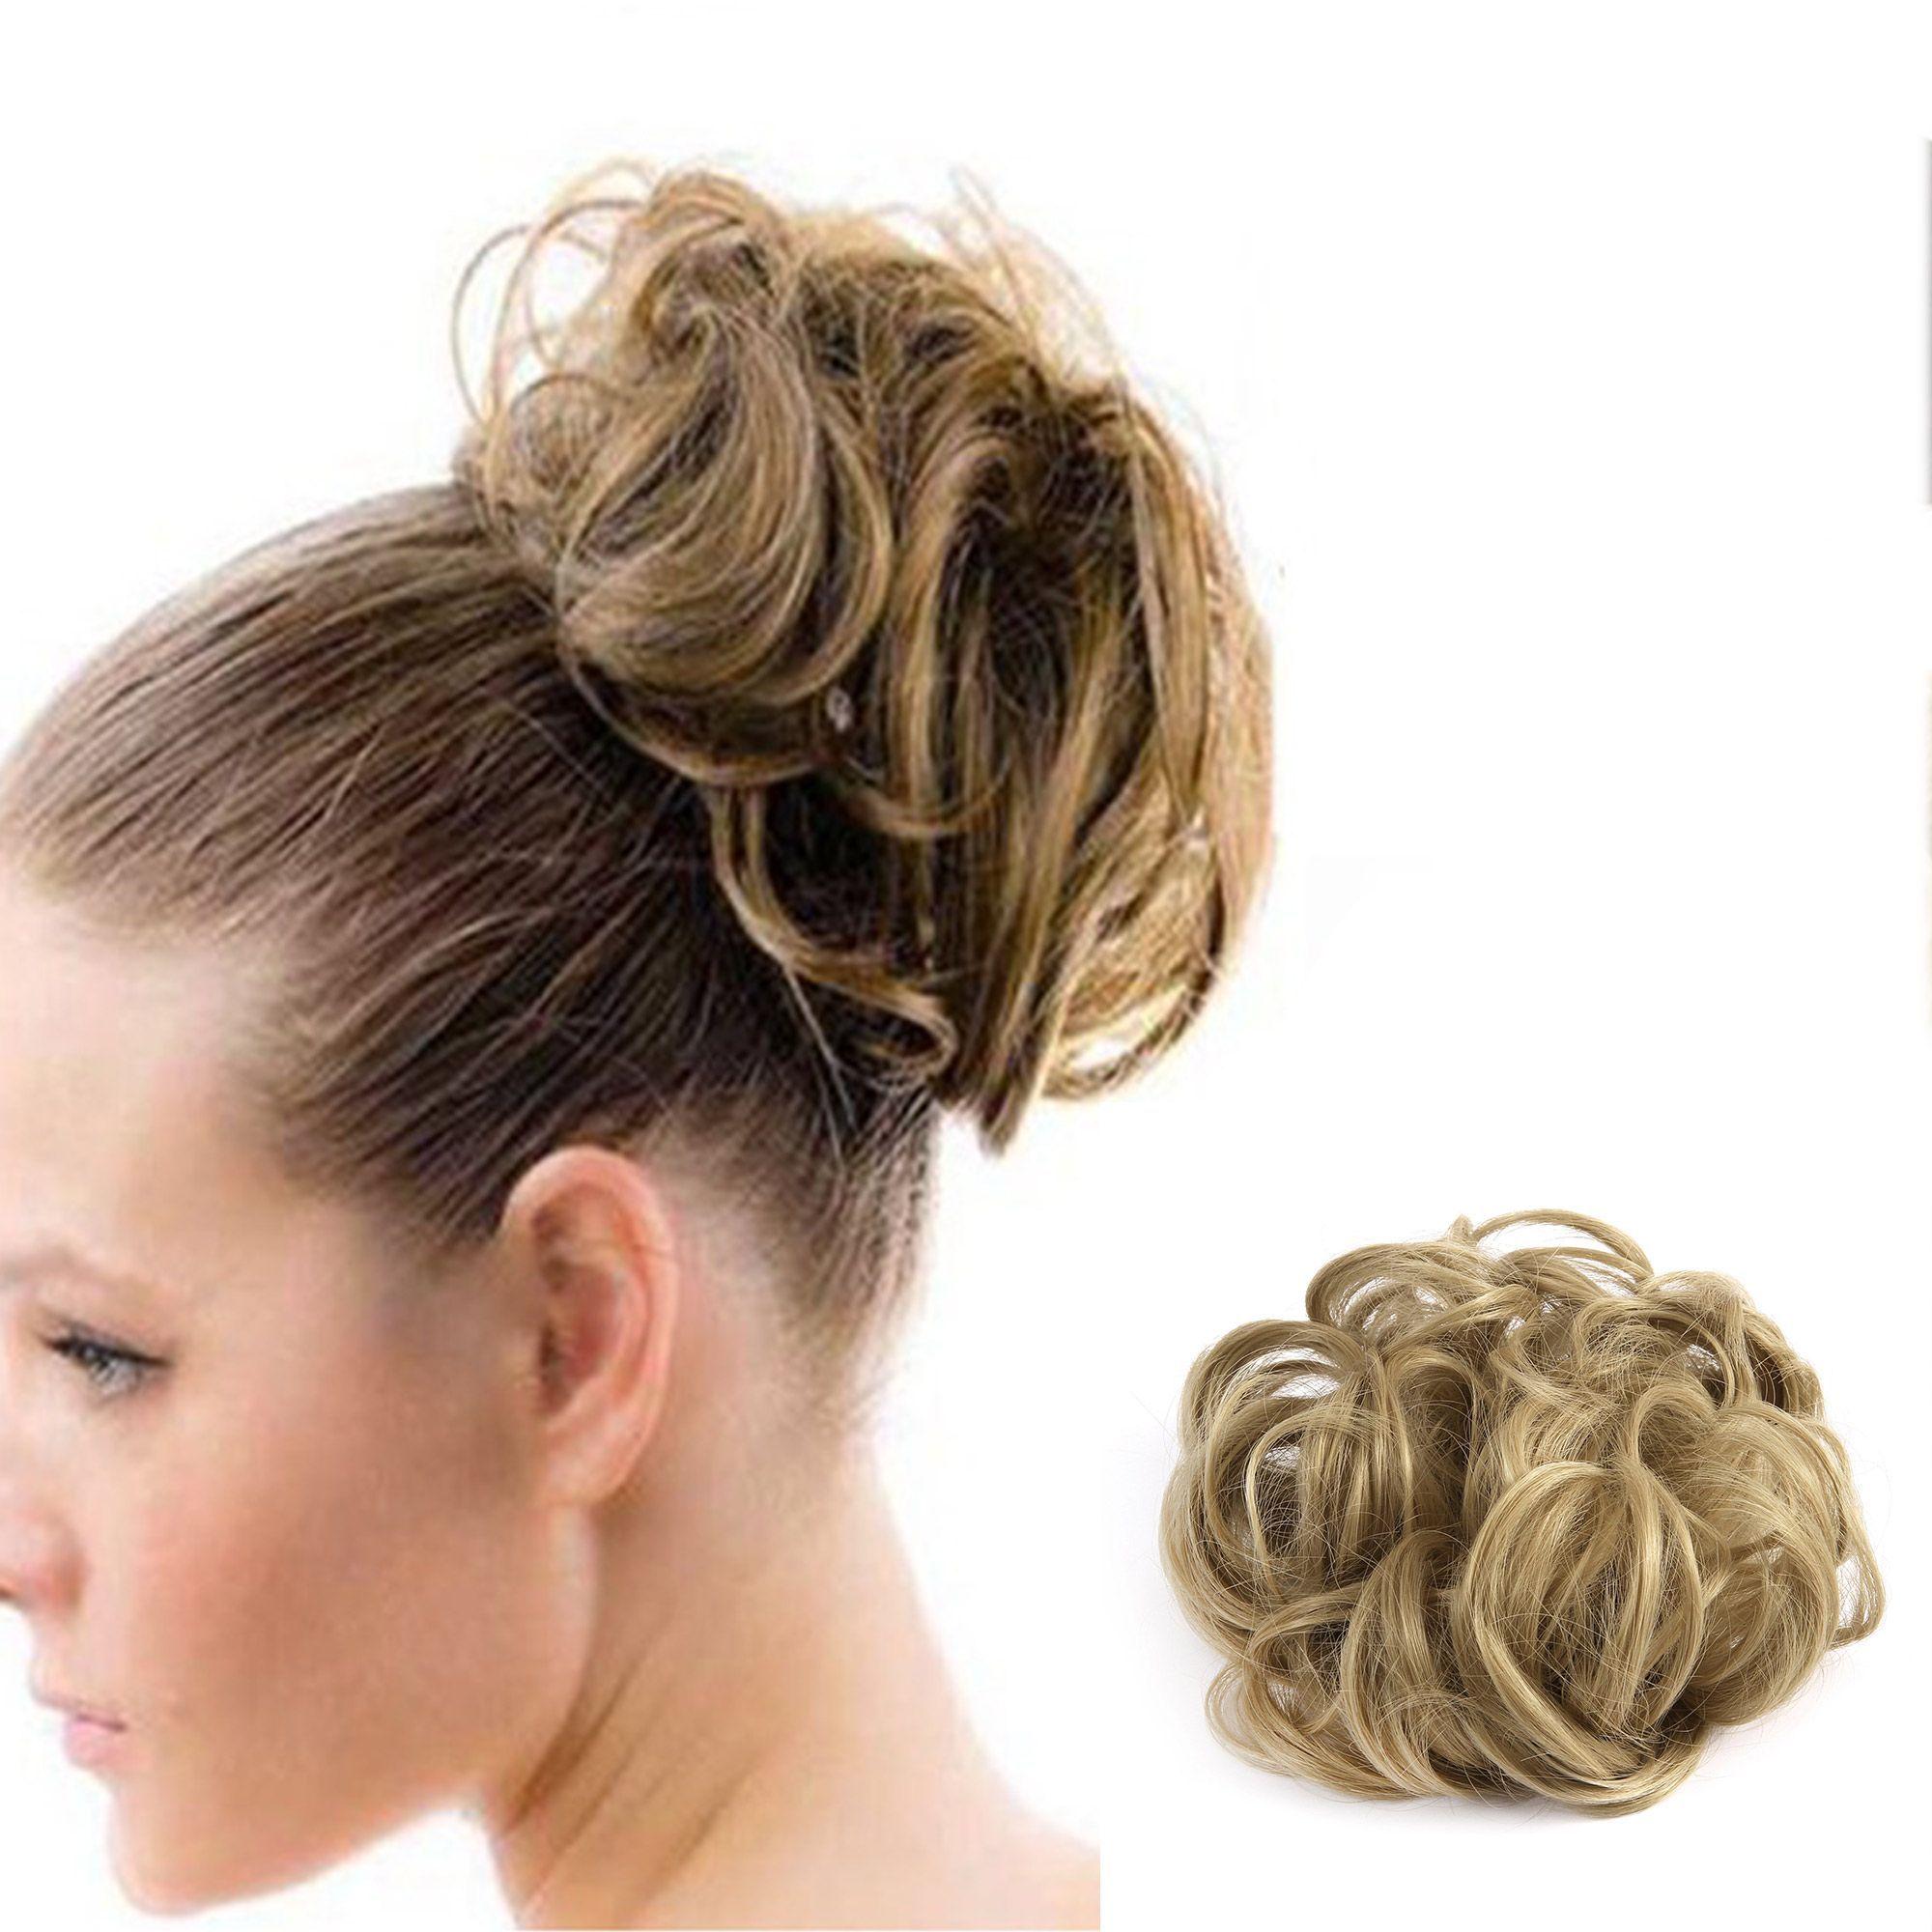 Beauty In 2020 Messy Hairstyles Bun Hairstyles Messy Bun Hairstyles